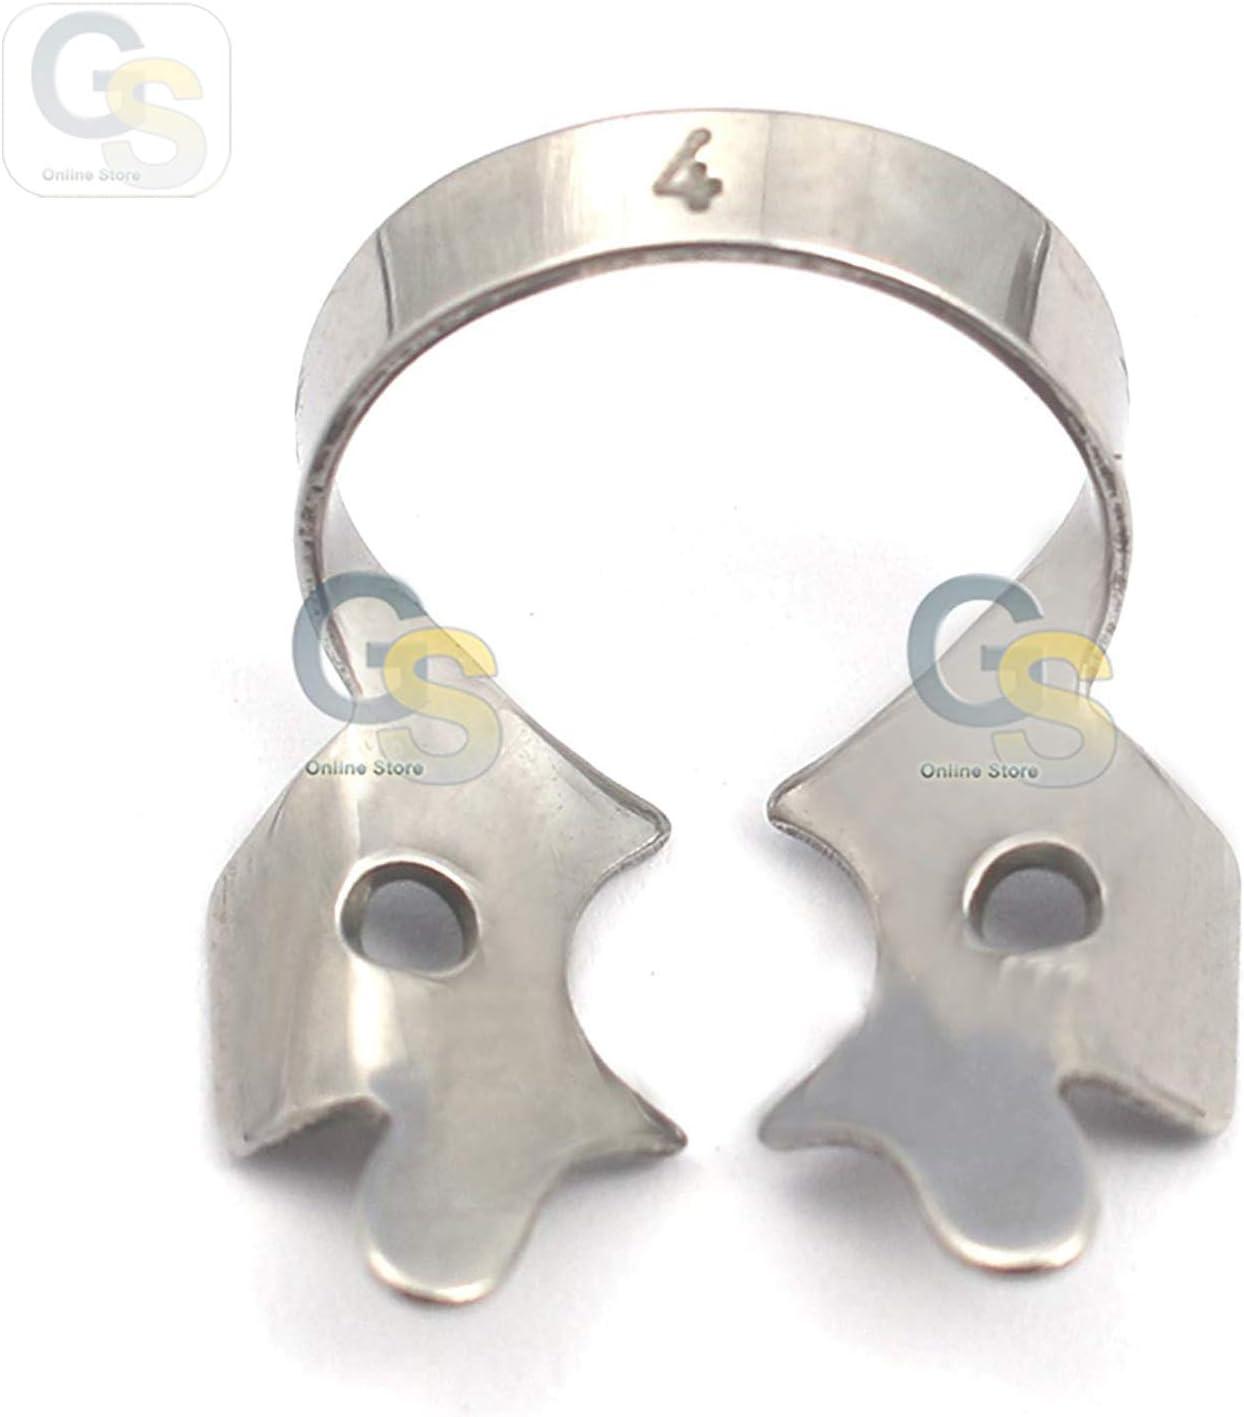 Superlatite G.S Dental Instrument Endodontic Clamp Adult 4 Best Quality Luxury